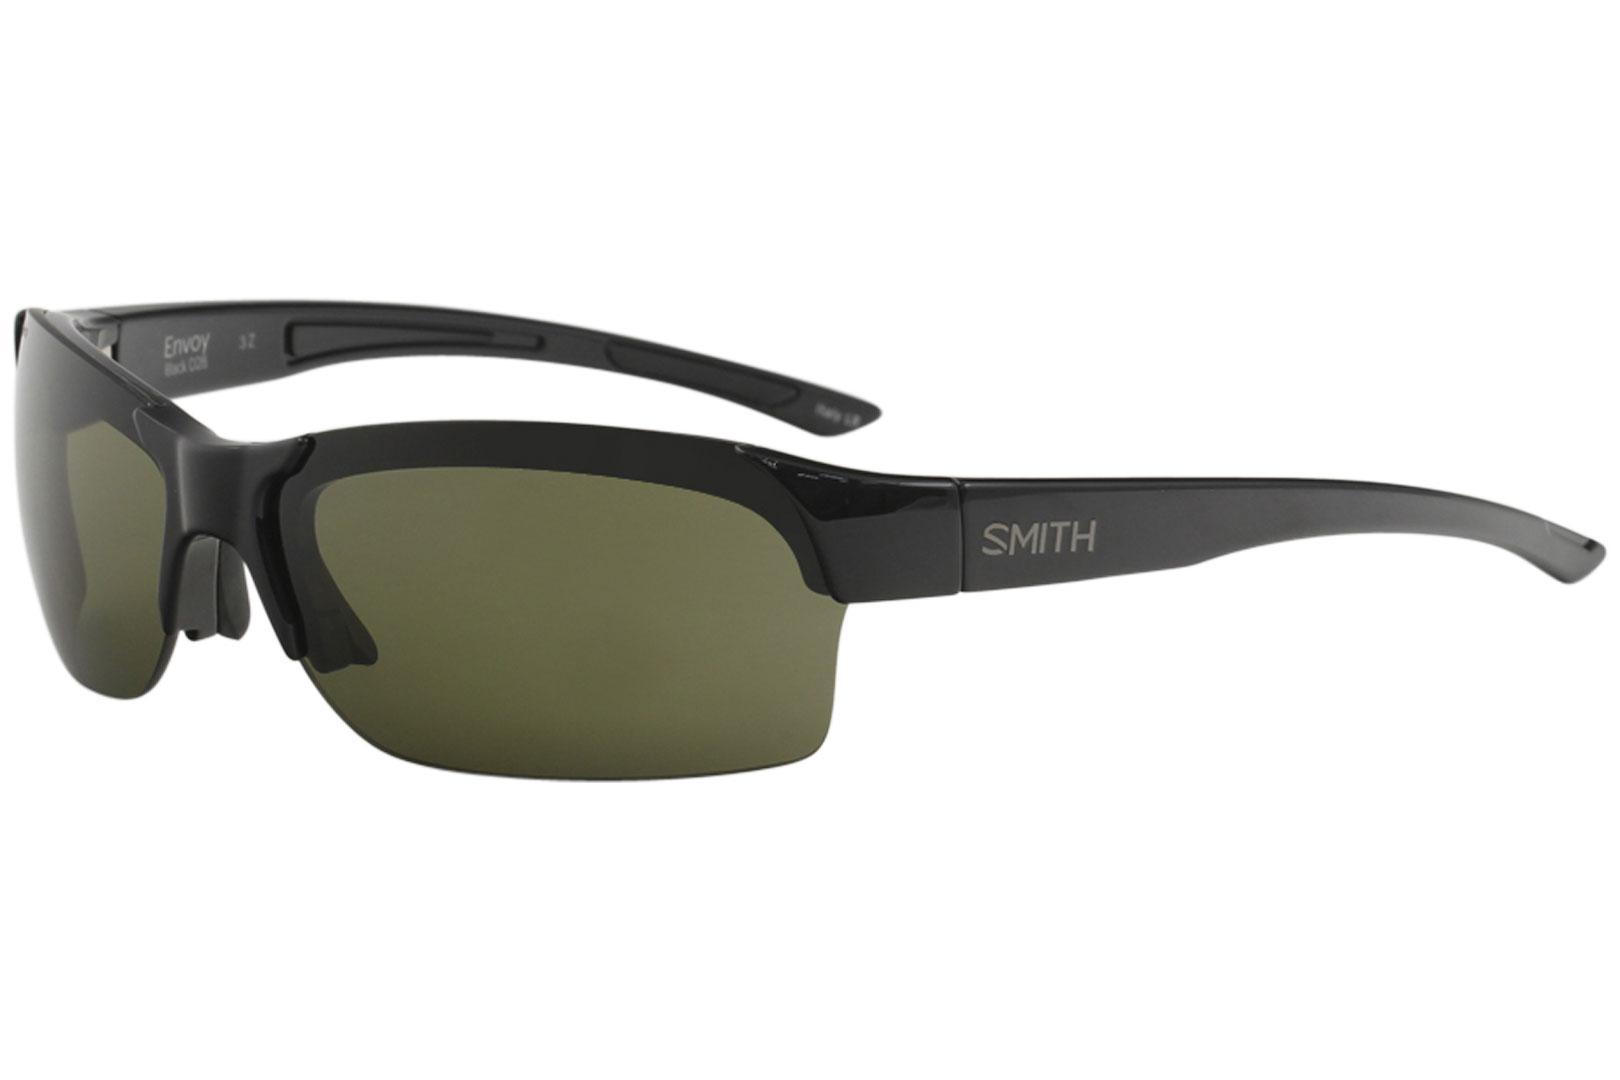 Image of Smith Optics Envoy Fashion Rectangle Sunglasses - Black - Lens 66 Bridge 16 Temple 115mm